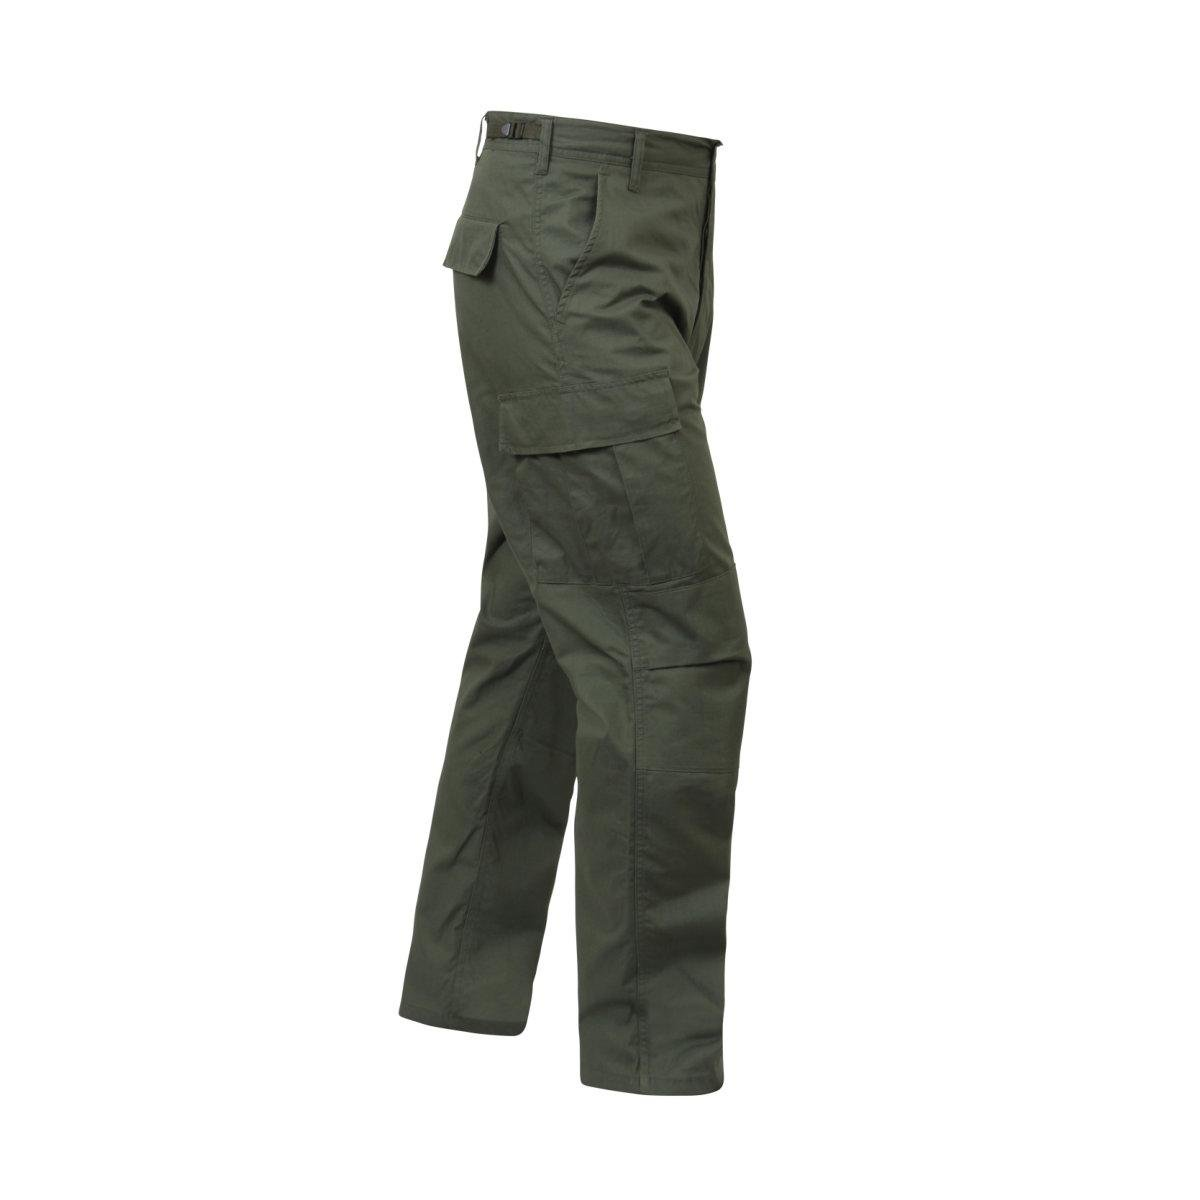 Rothco BDU R/S Short Length Pants Pro-Motion Distributing - Direct 613902595736